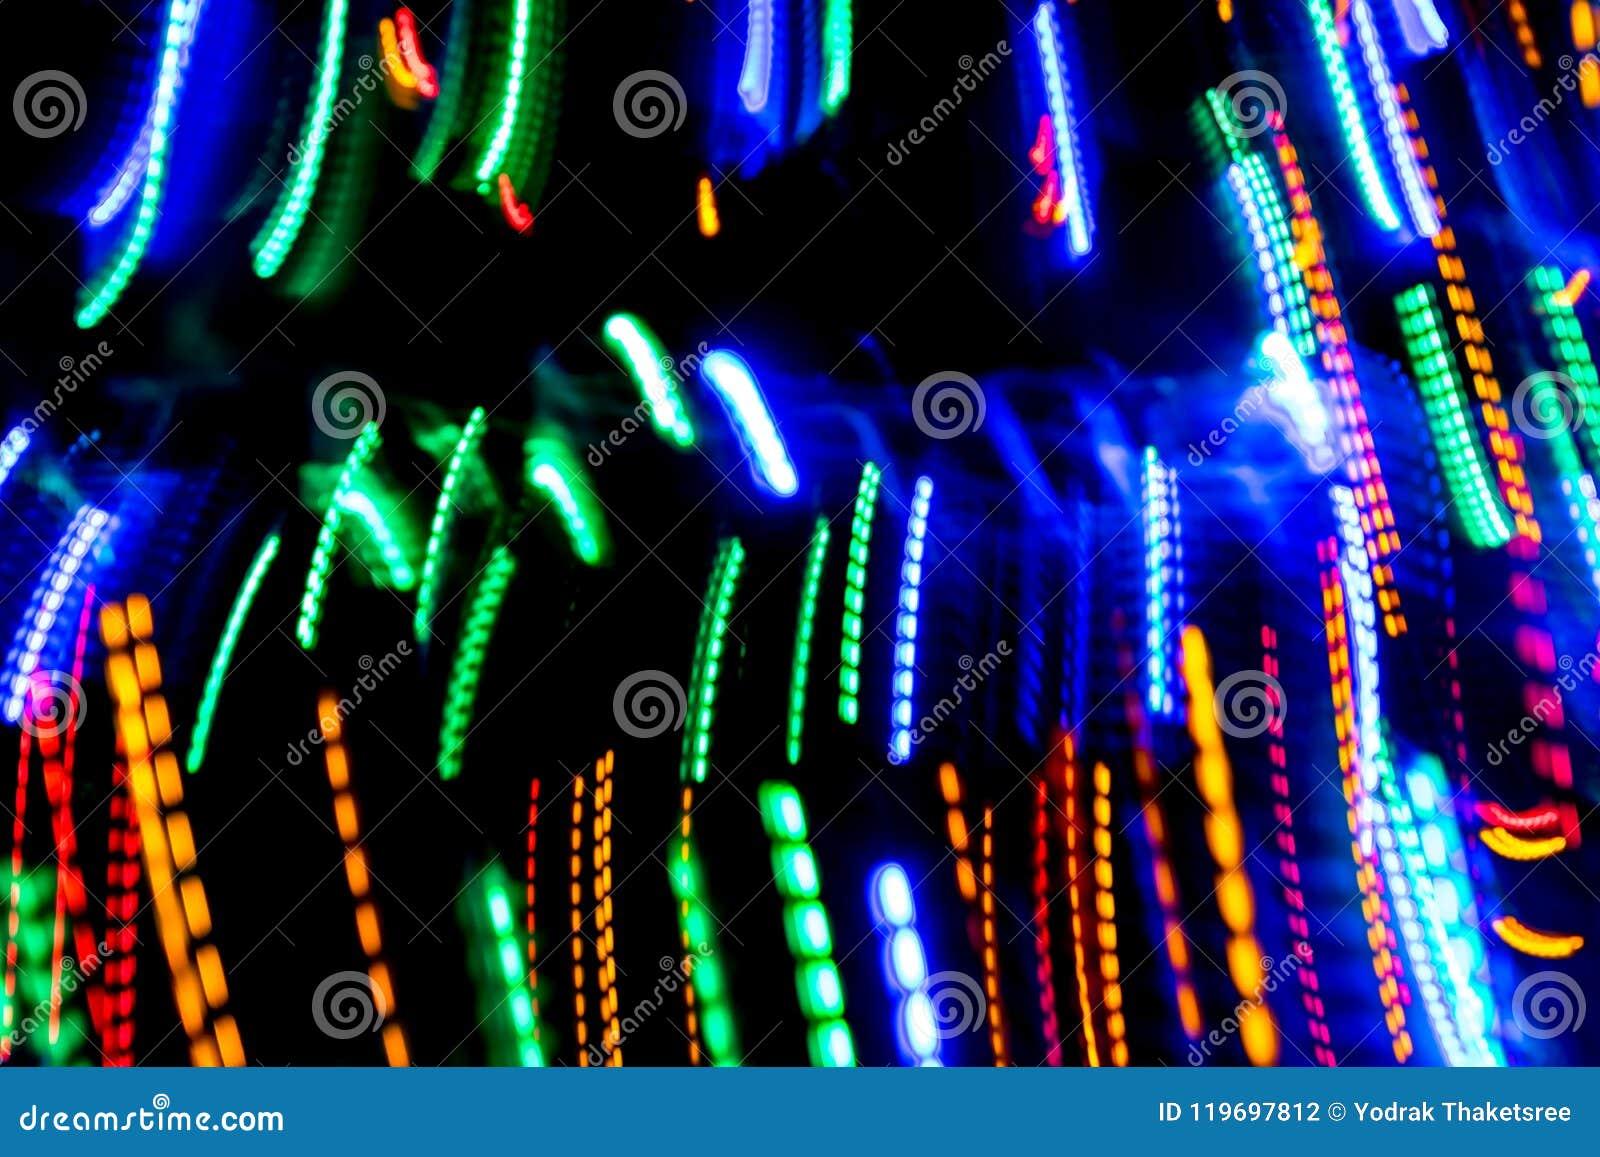 Lighting Neo Pattern Background Stock Photo - Image of focus